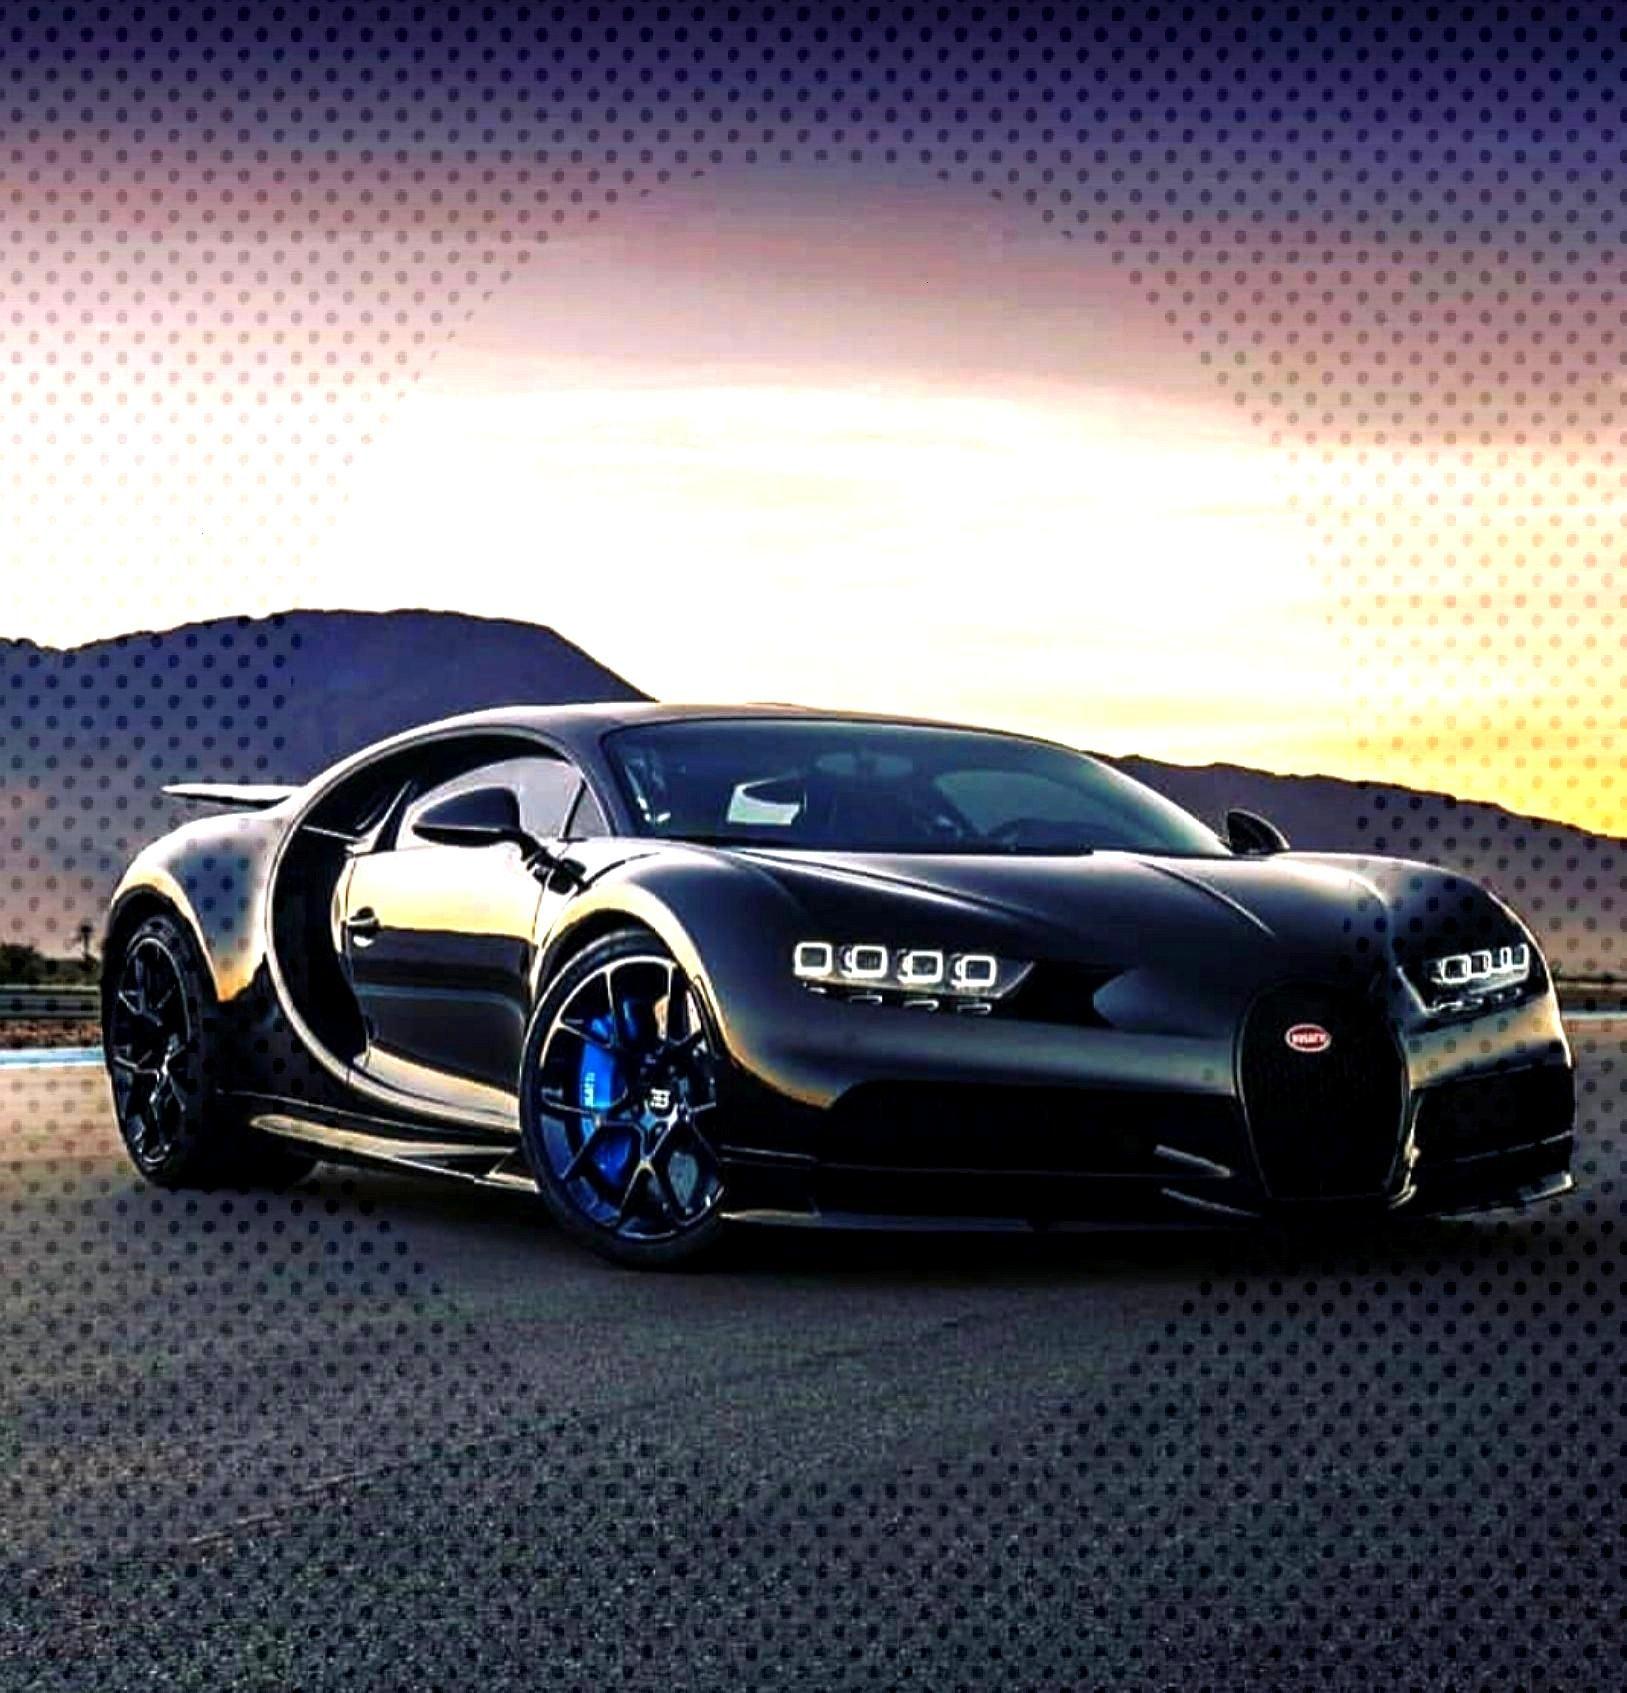 Bugattiveyronsupersport Volkswagenclassiccars Luxurycars Sportcars Hypercars Supercars Bugatti Veyron Chiron In 2020 Bugatti Veyron Sports Cars Luxury Bugatti